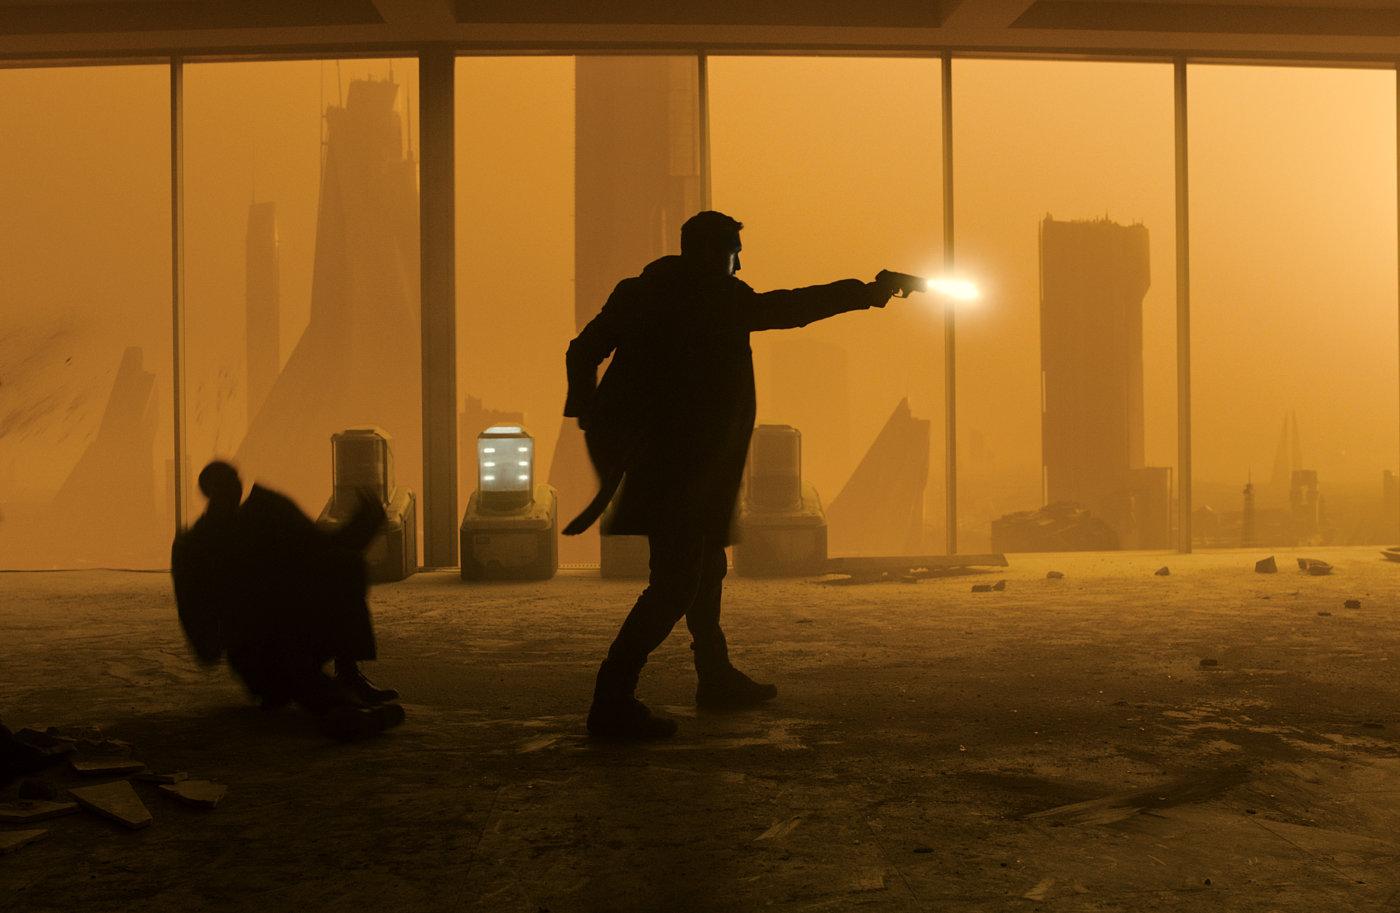 iztrebljevalec 2049 Blade Runner